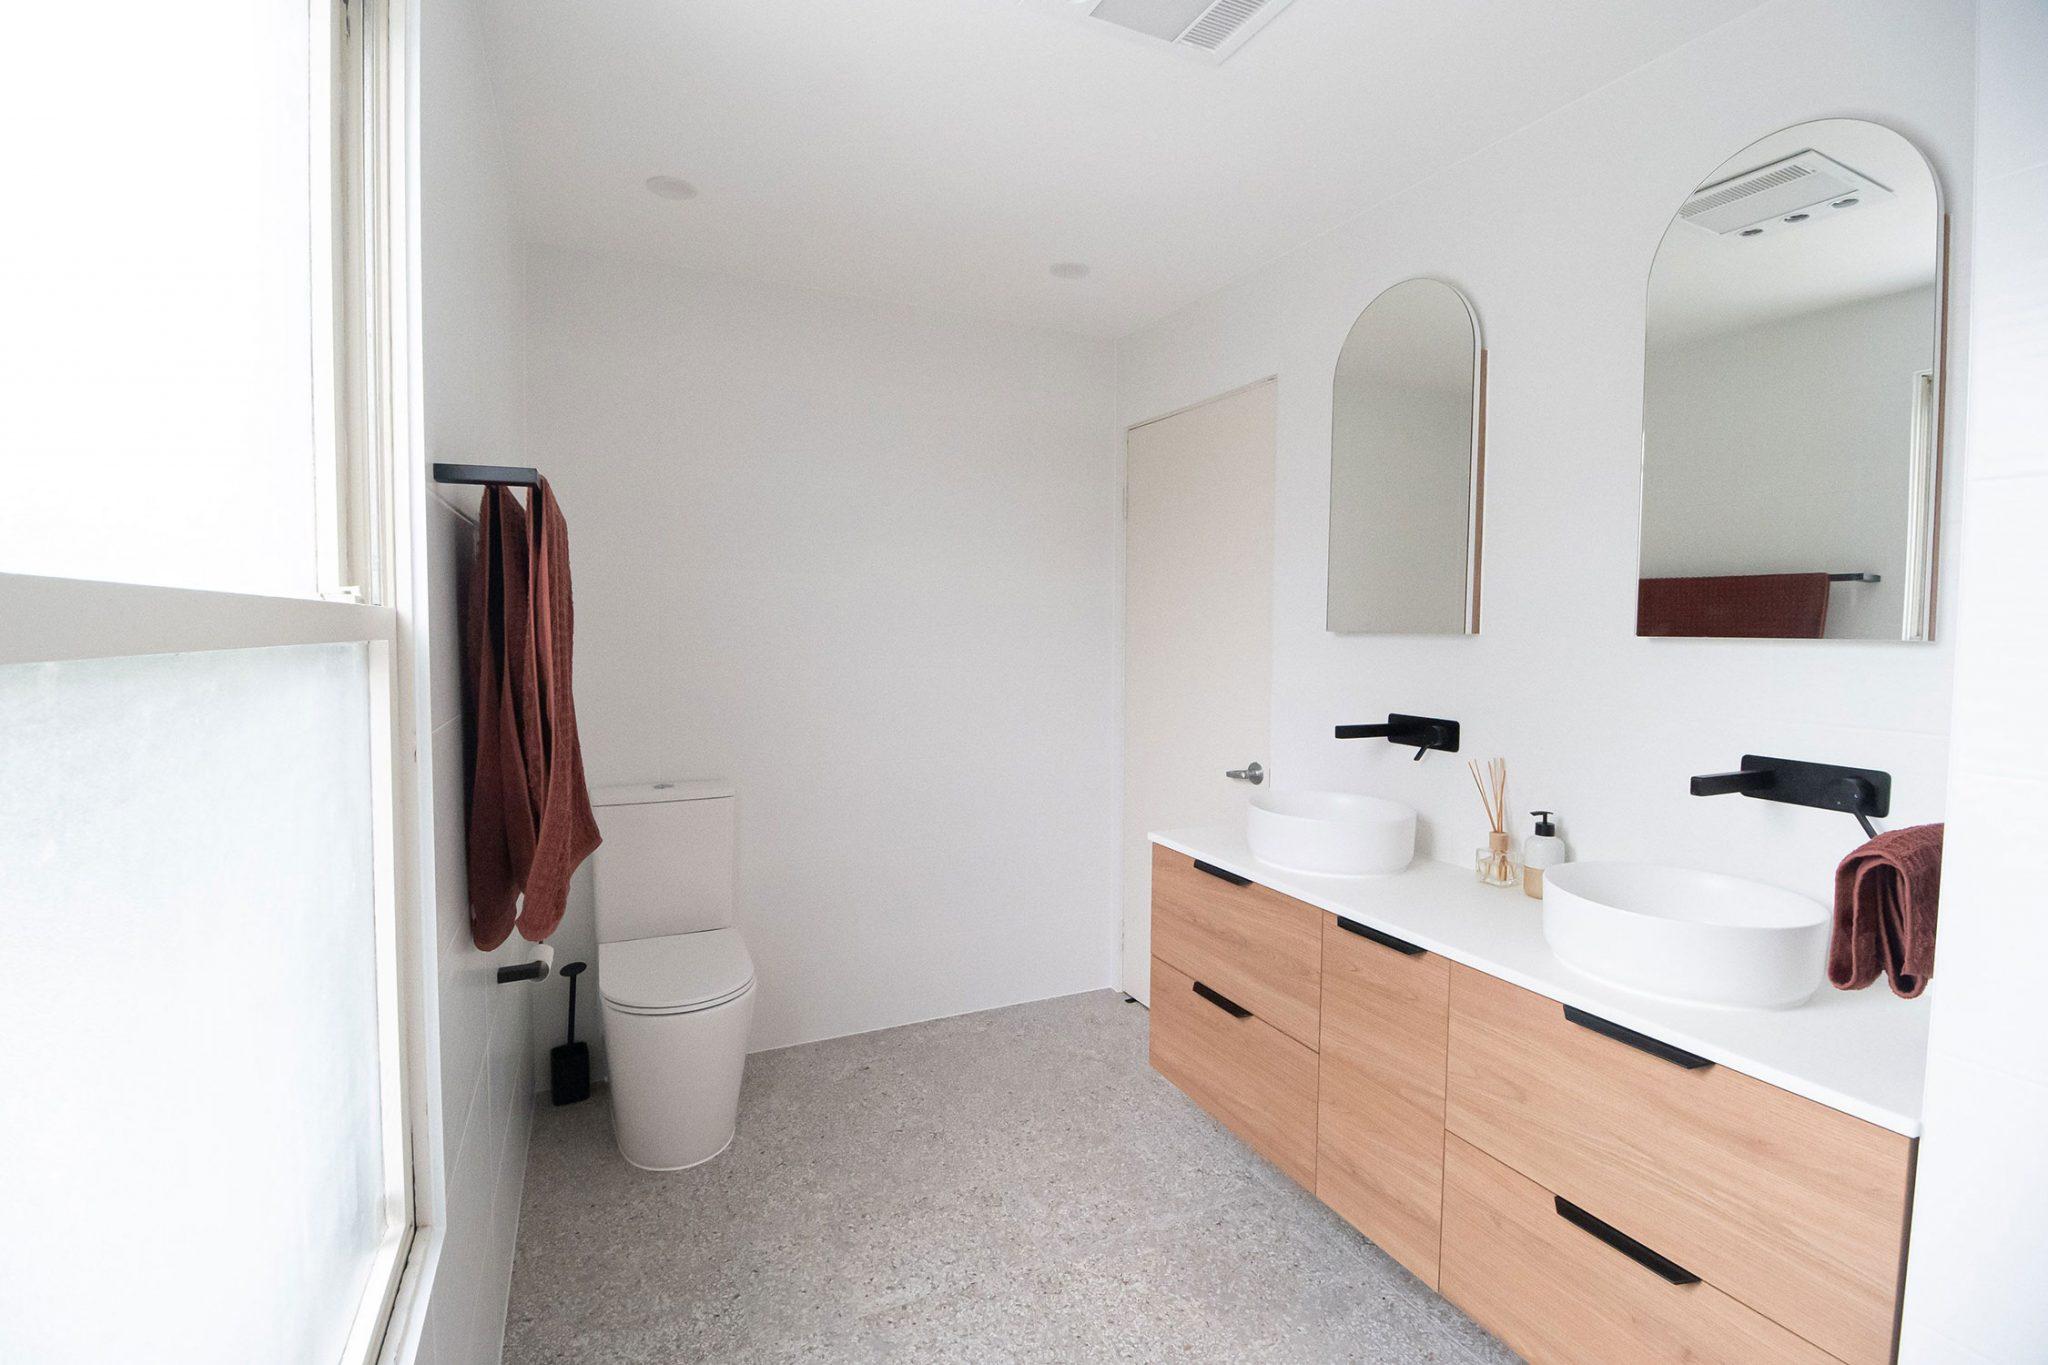 Belle bathrooms - bathroom renovations - Rydalmere Australia